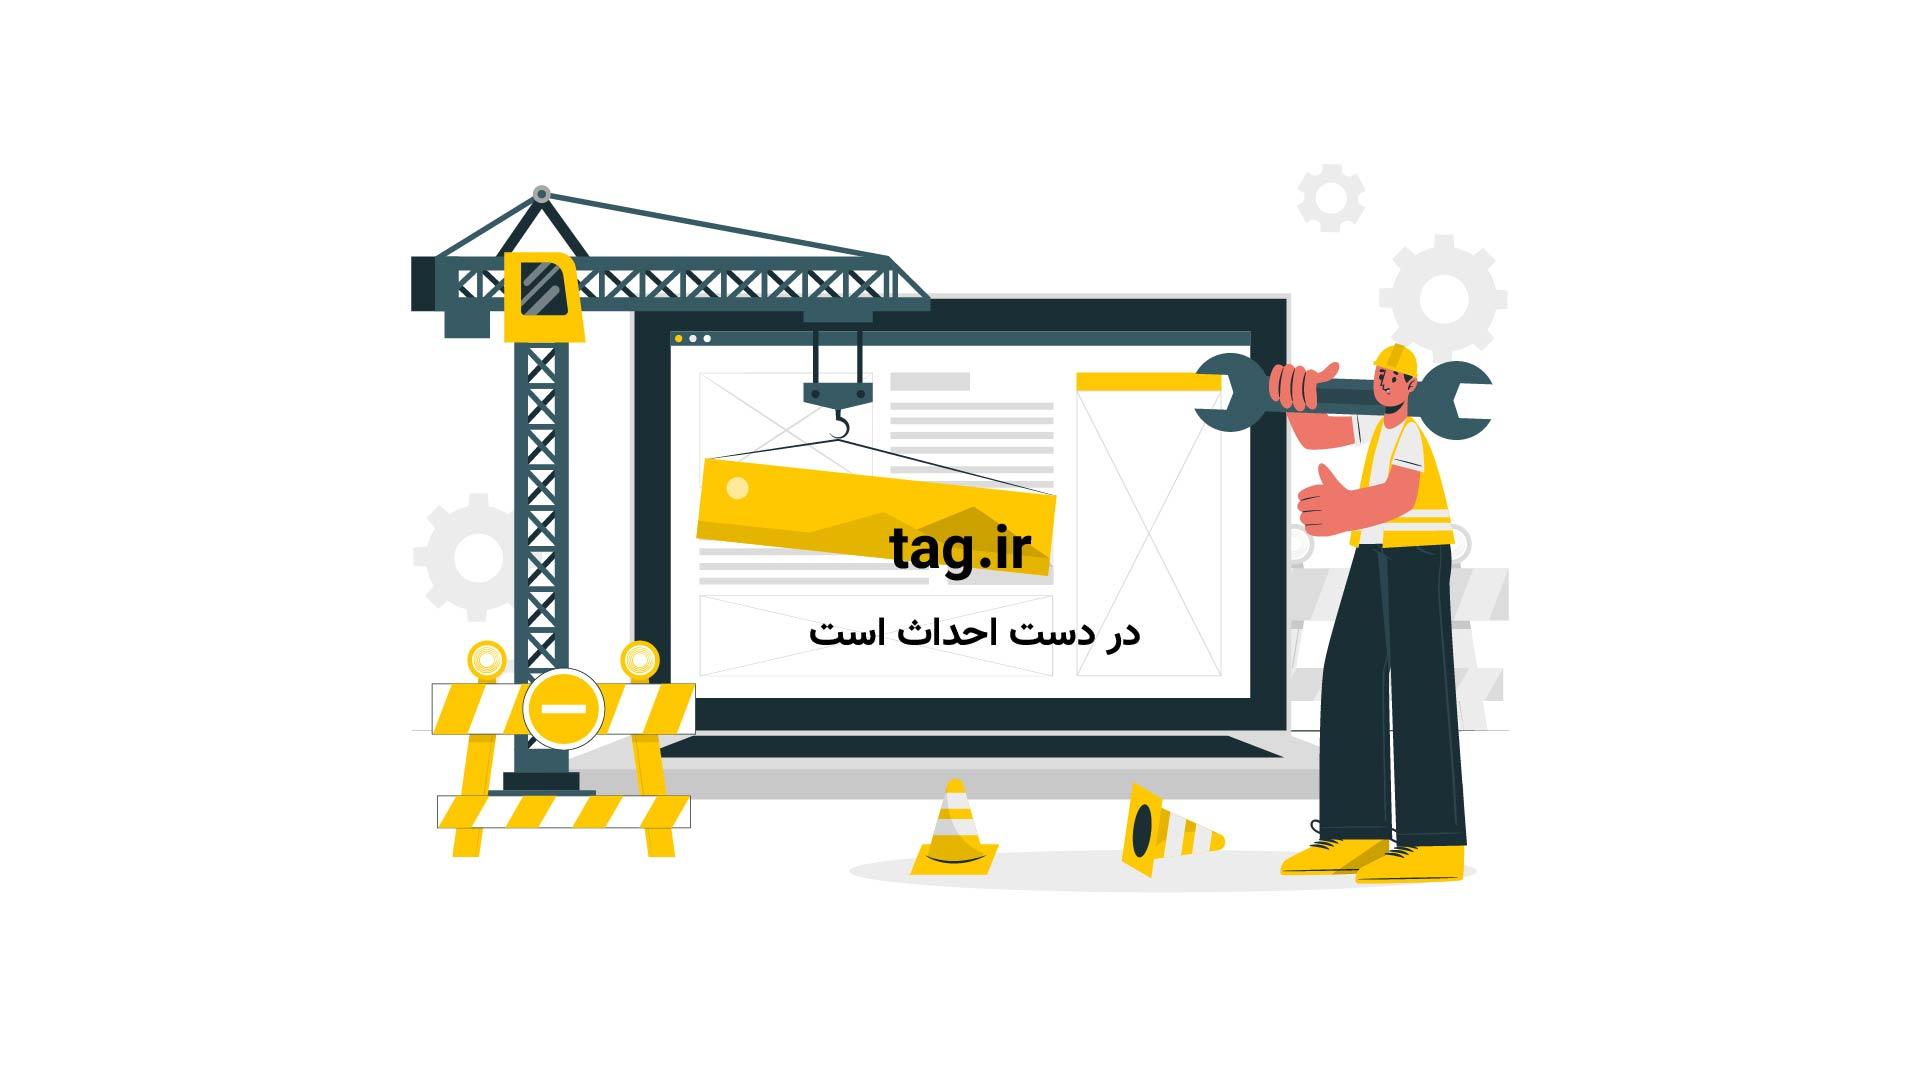 پاندا در برف | تگ